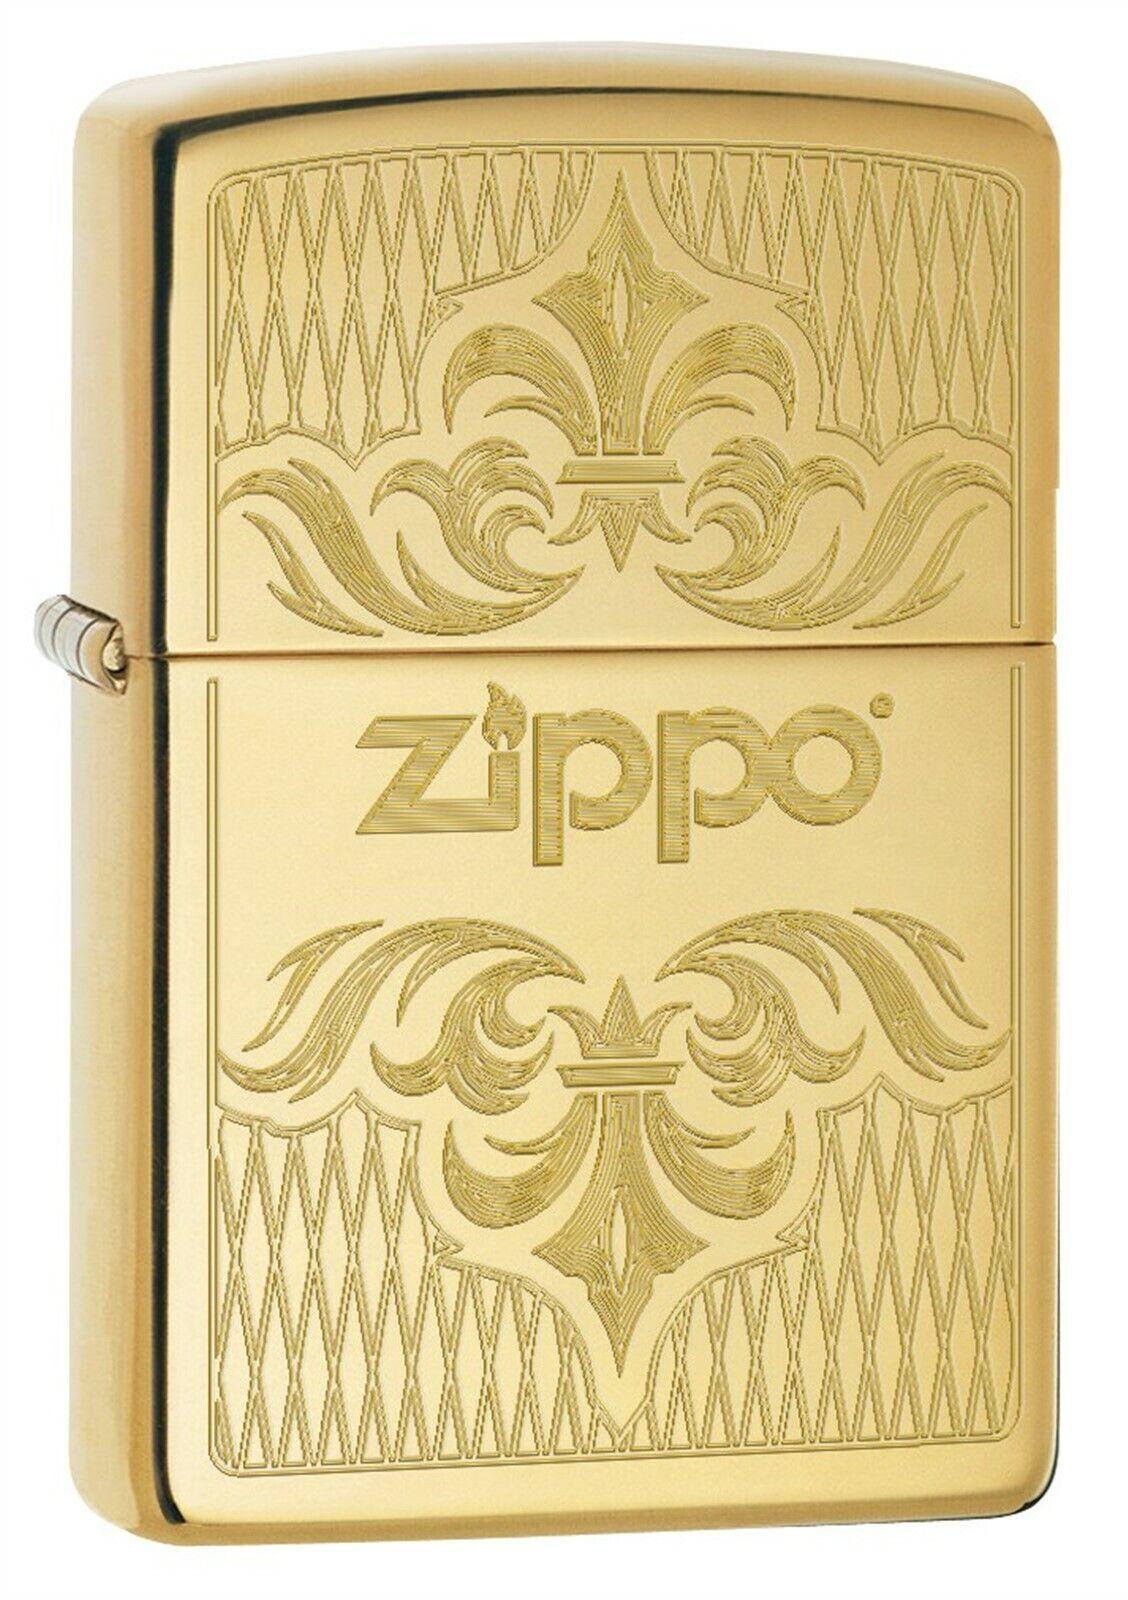 Zippo Lighter: Regal Zippo Design, Engraved - High Polish Br